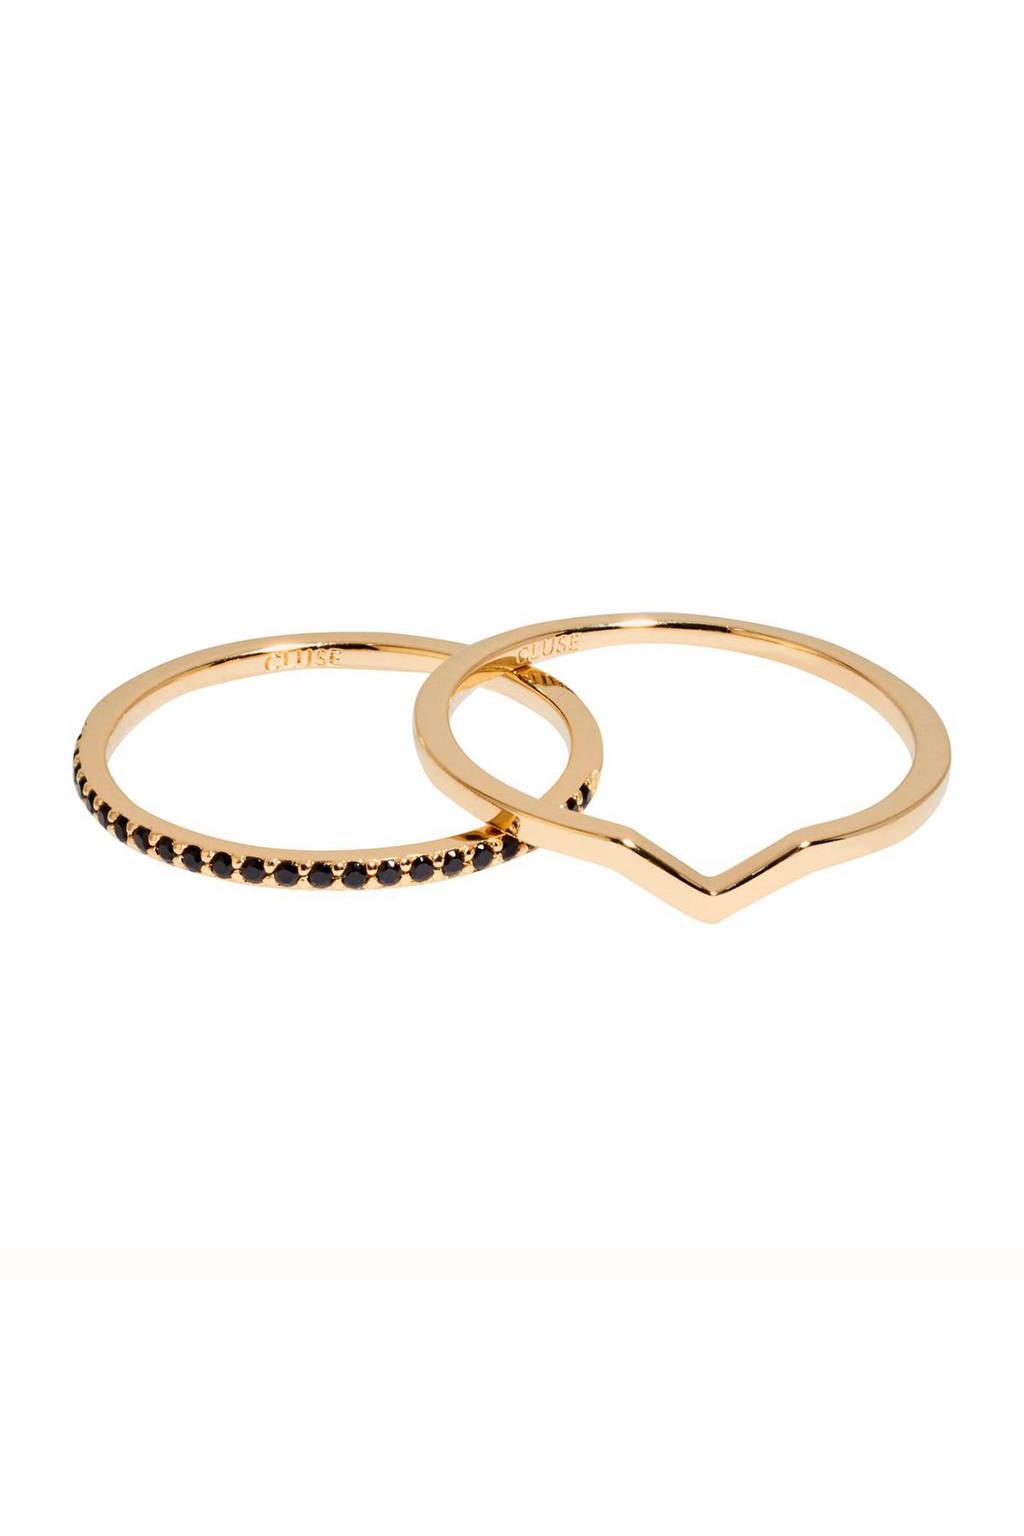 CLUSE ring - CLJ41004, Goudkleurig/zwart